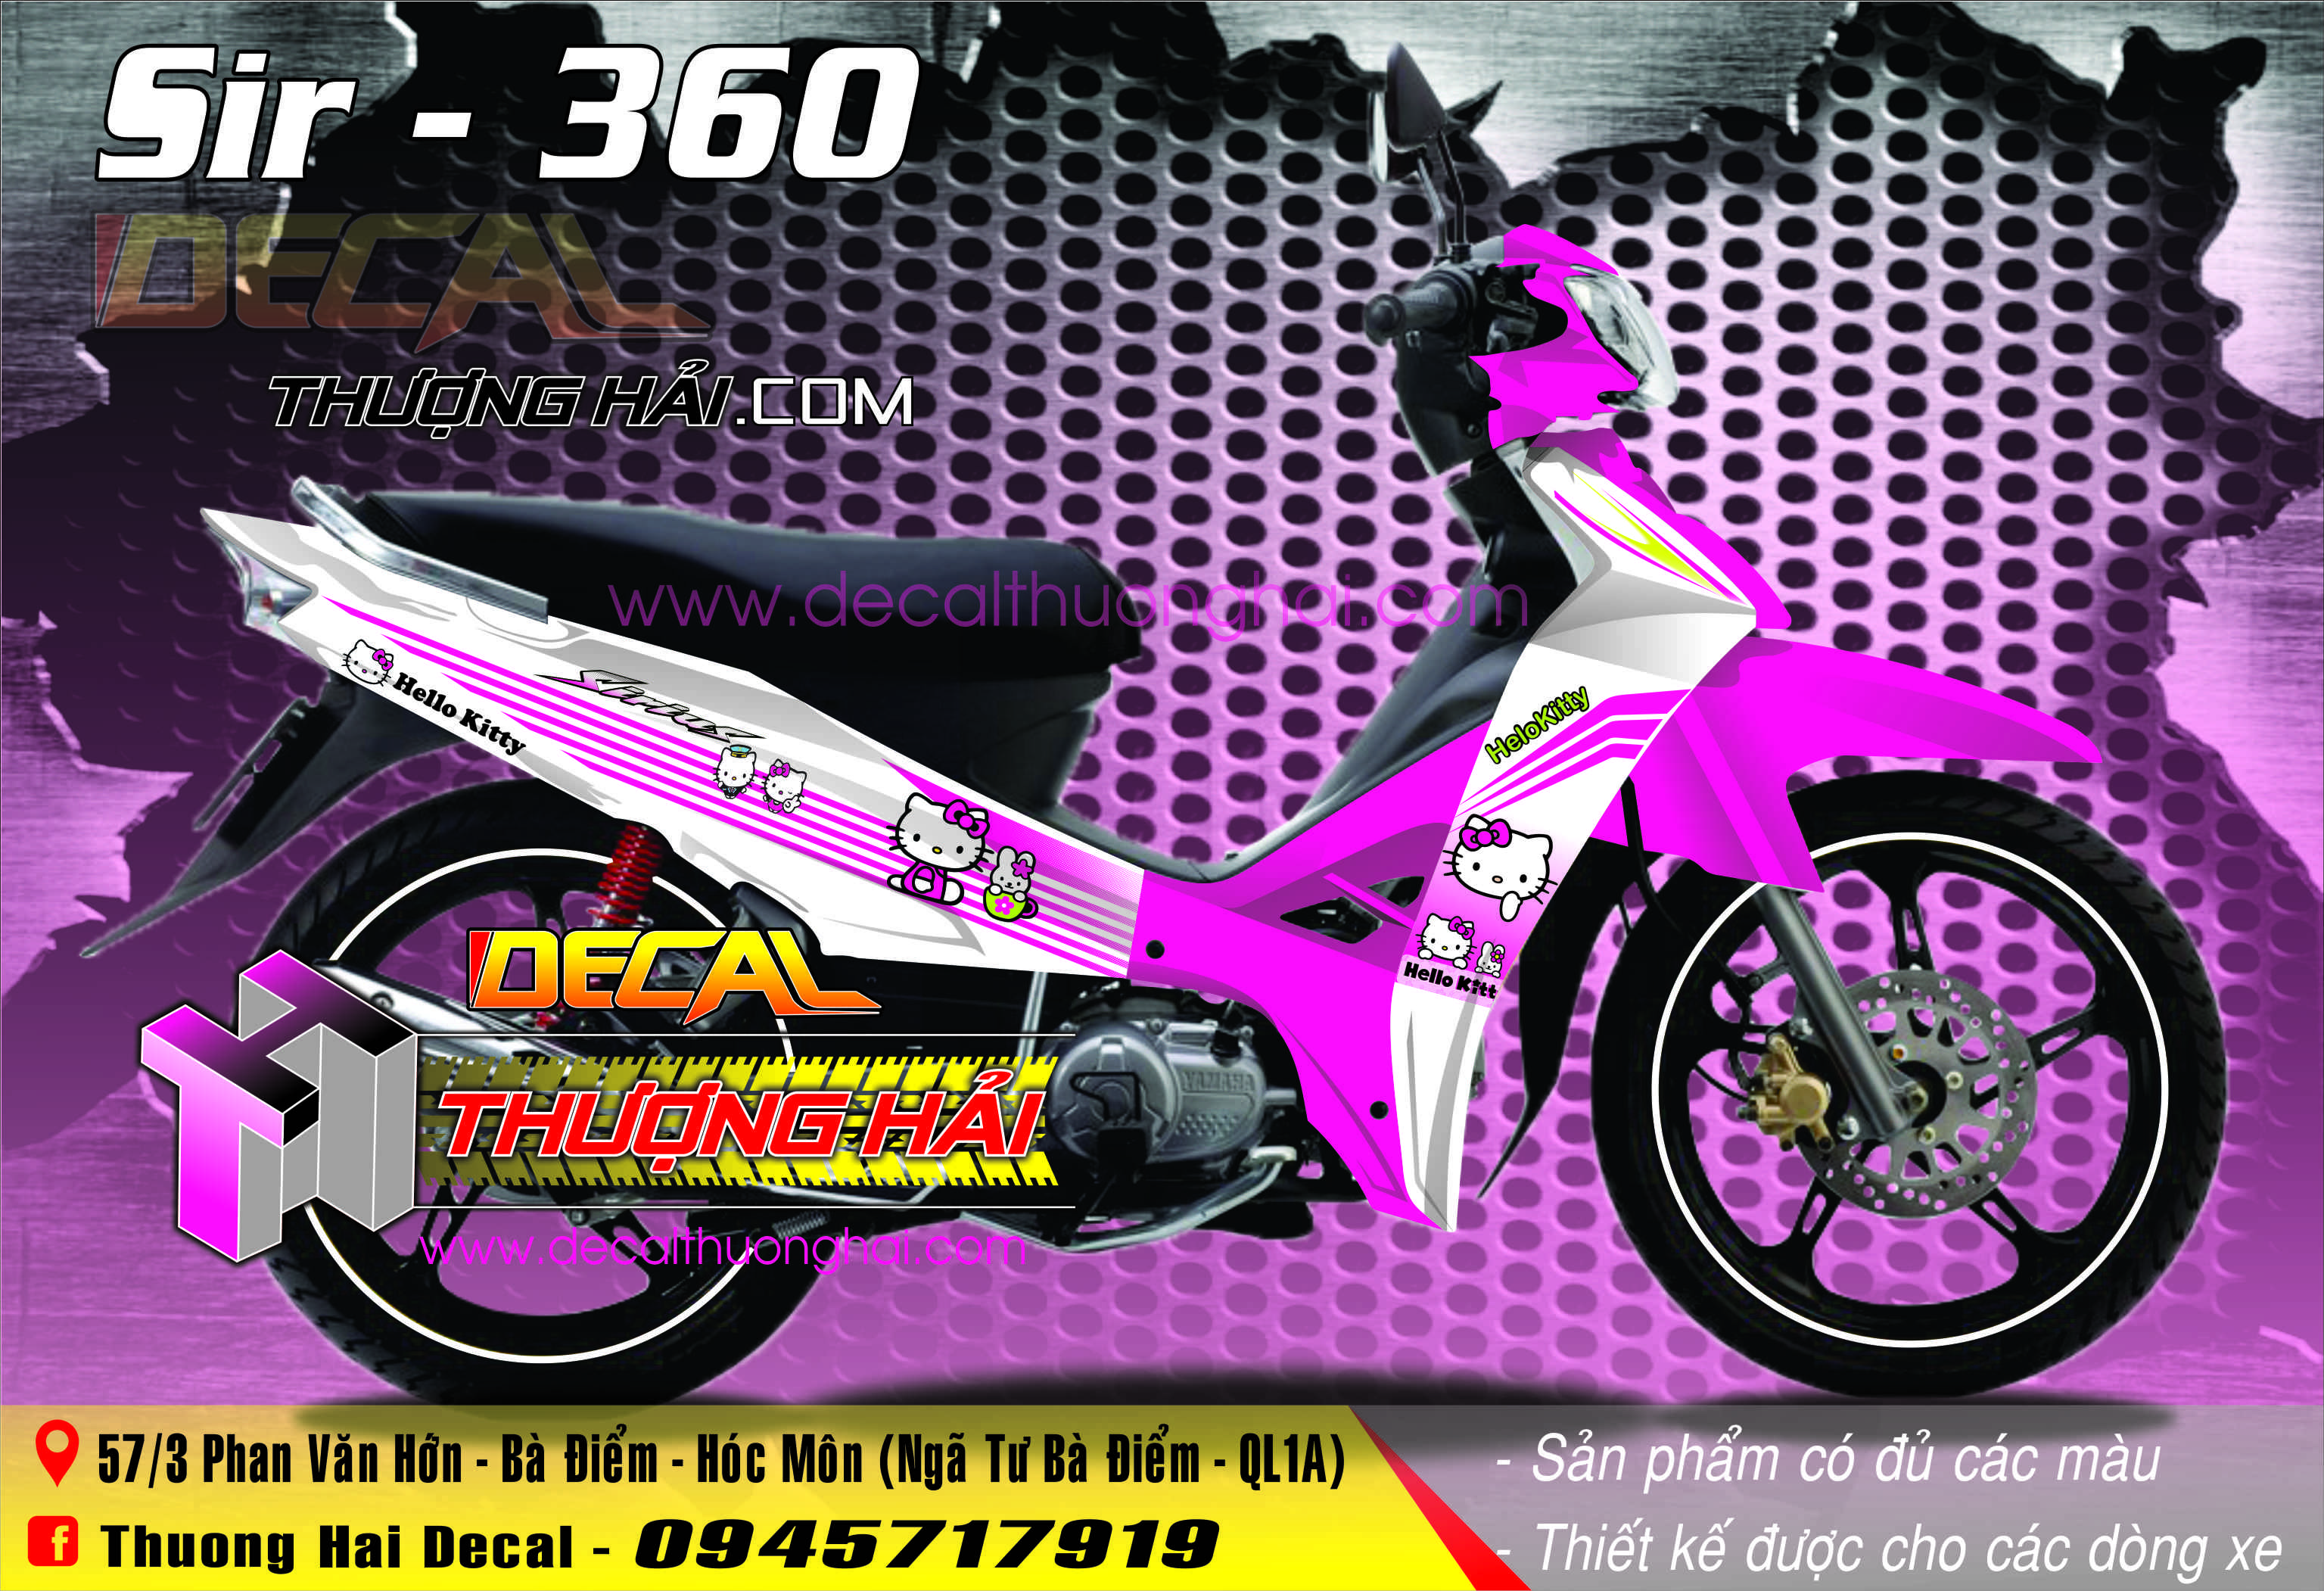 Tem Xe Yamaha Sirius Helo Kitty Trắng Hồng - 360